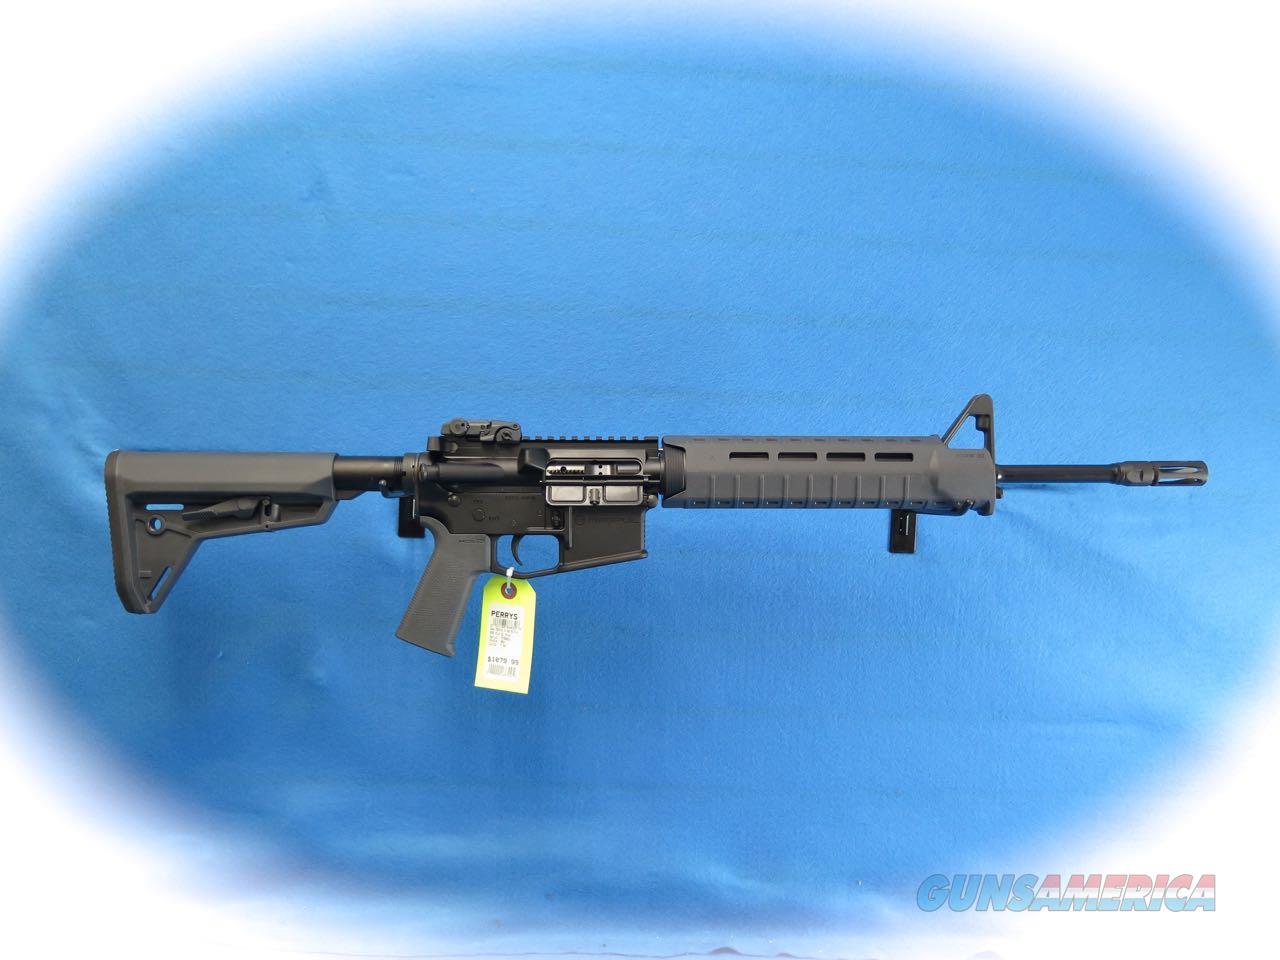 Smith & Wesson M&P15 MOE Stealth Grey 5.56MM Semi Auto Rifle Model 11553 **New**  Guns > Rifles > Smith & Wesson Rifles > M&P